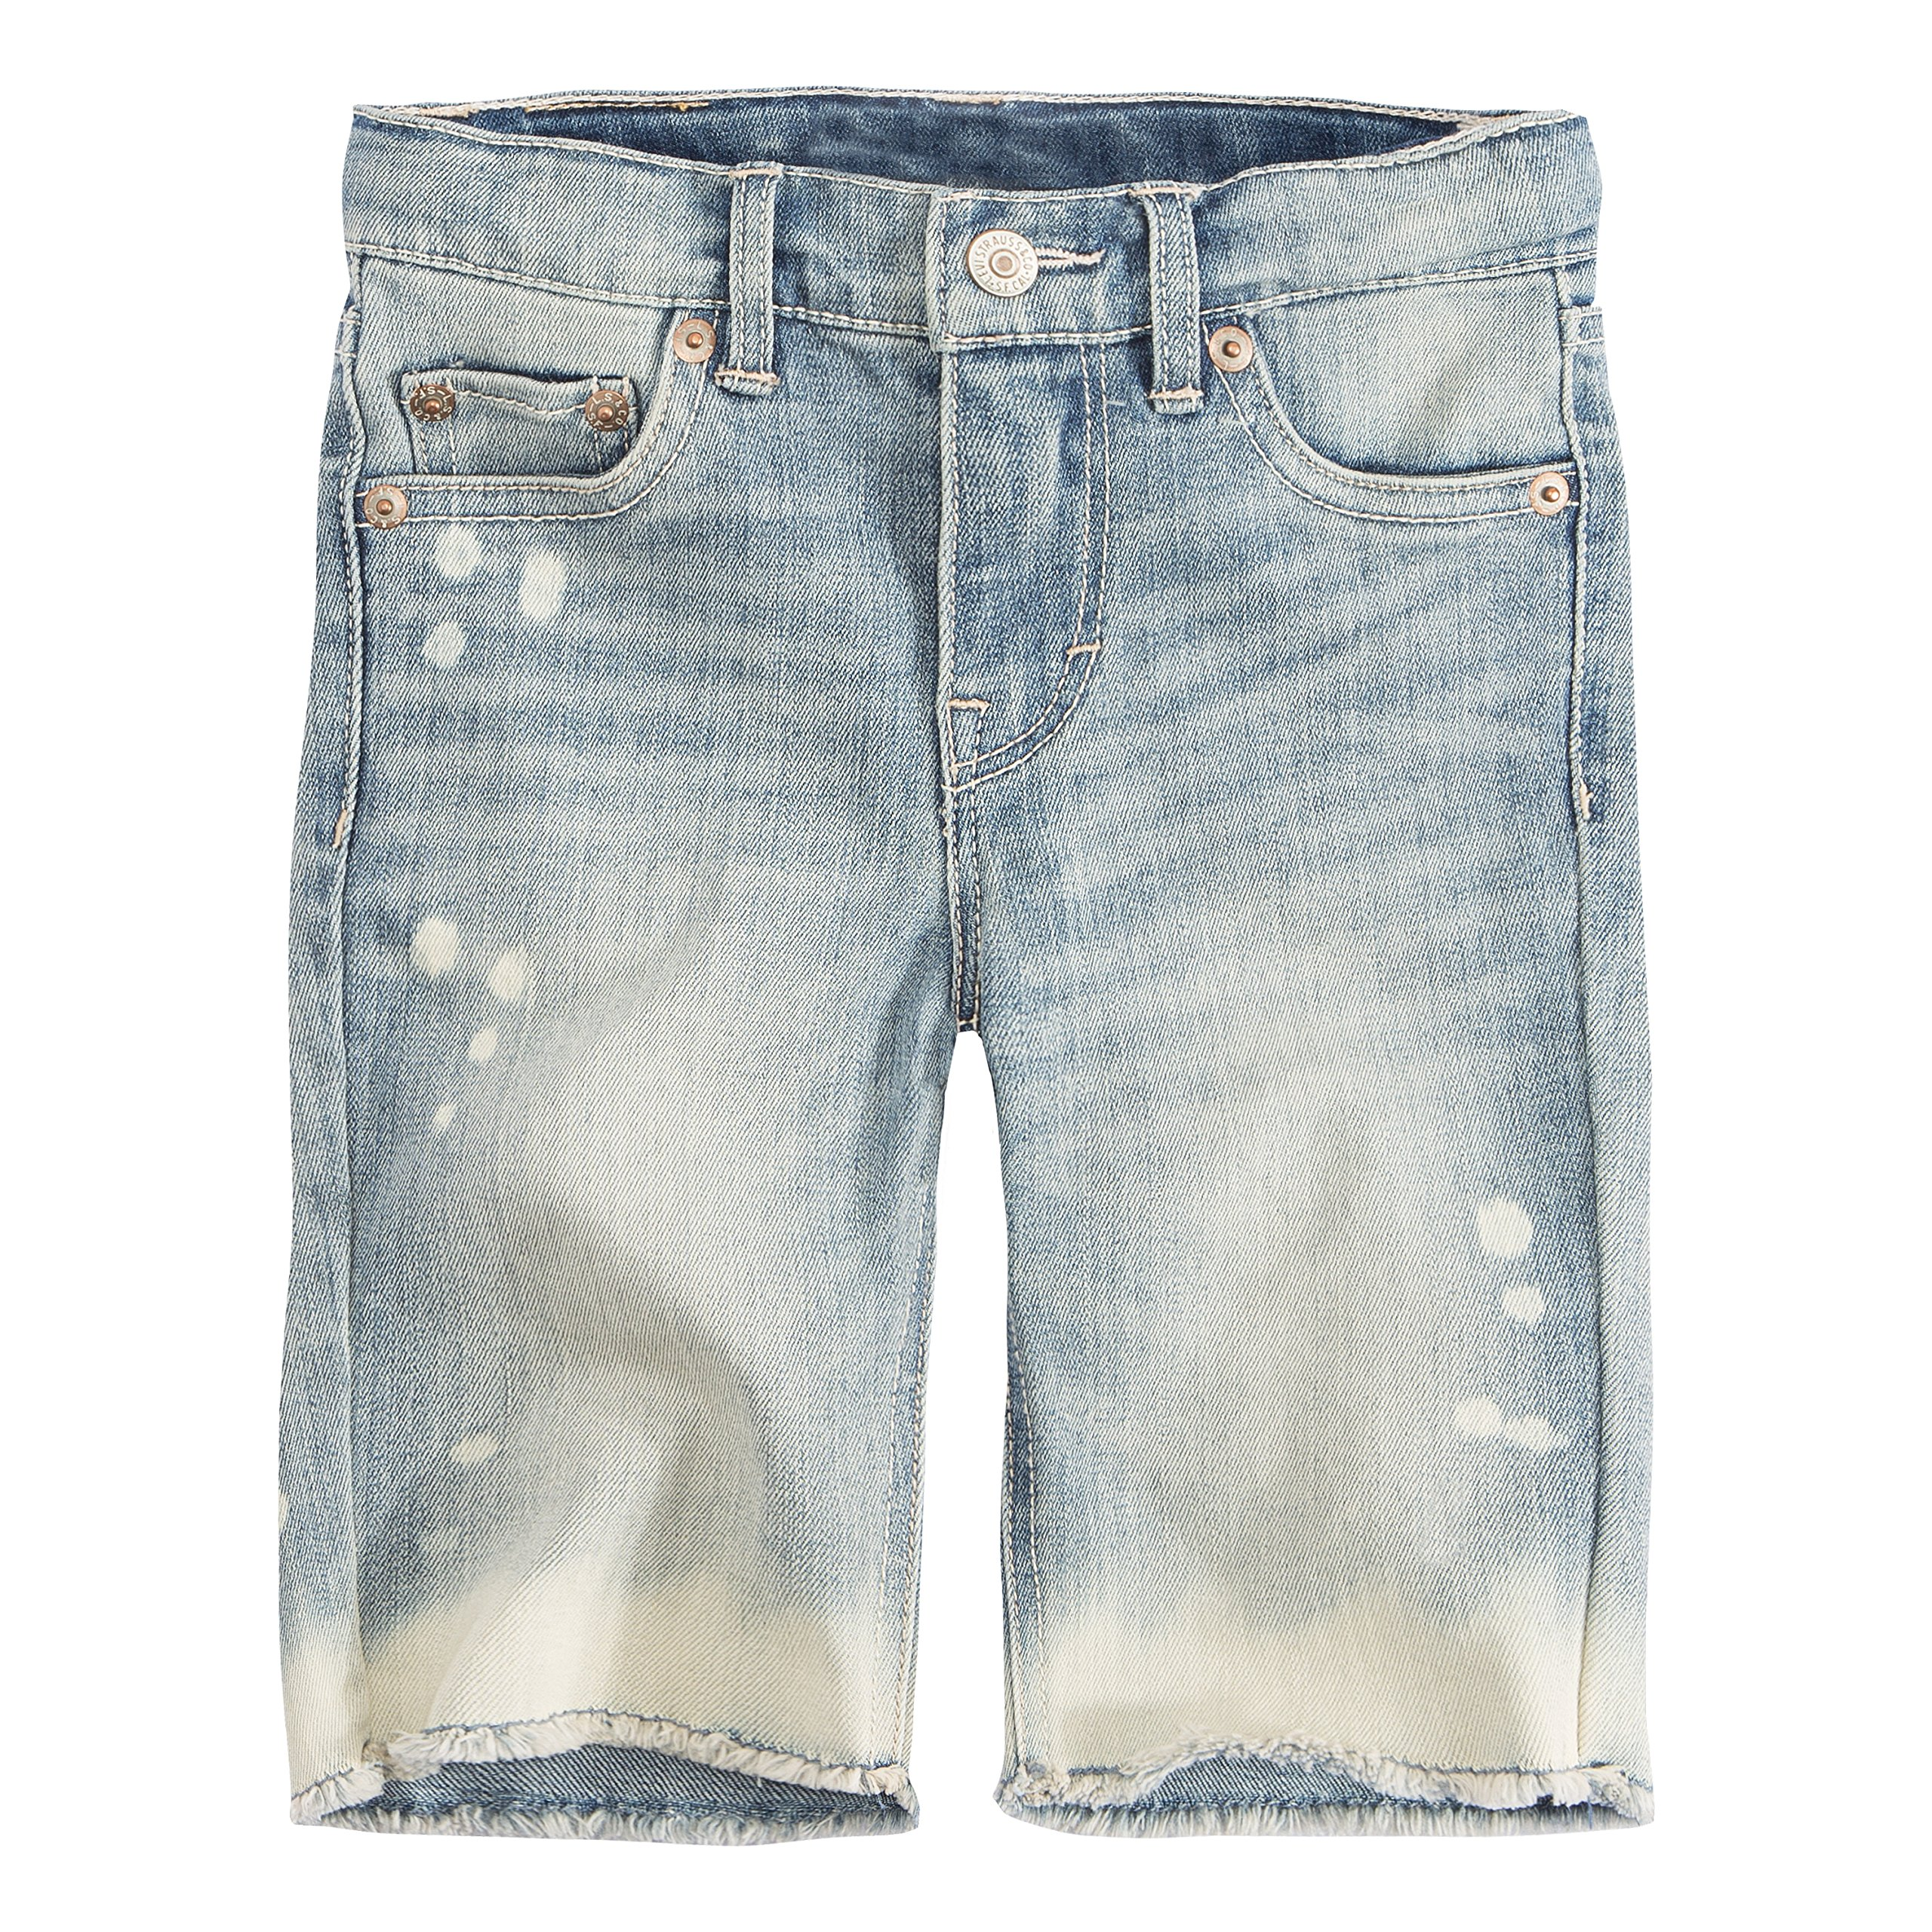 Levi's Little Girls' Denim Bermuda Shorts, Weathered Indigo, 5